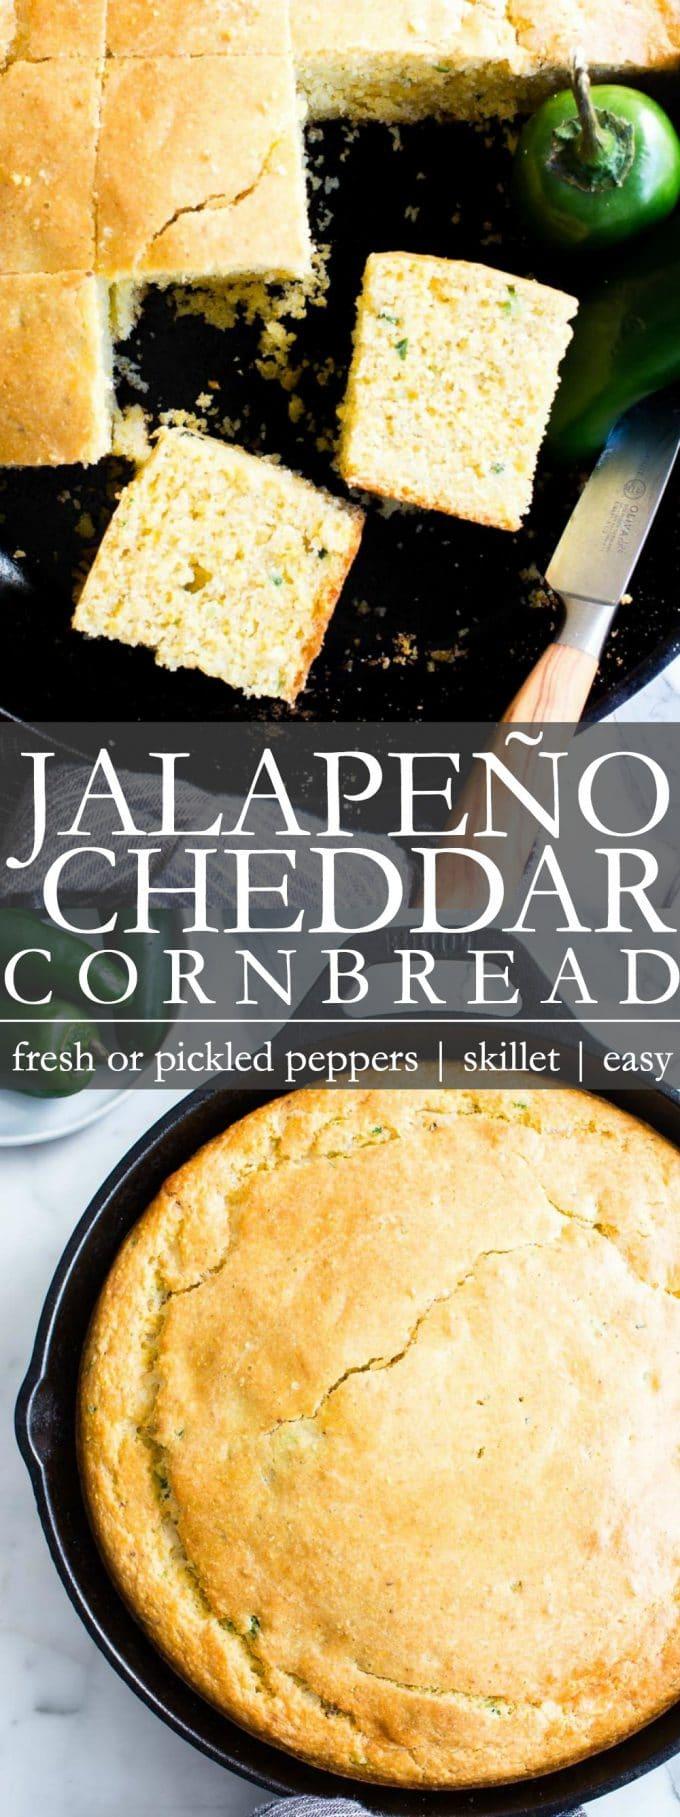 Jalapeno Cheddar Cornbread Pinterest Pin